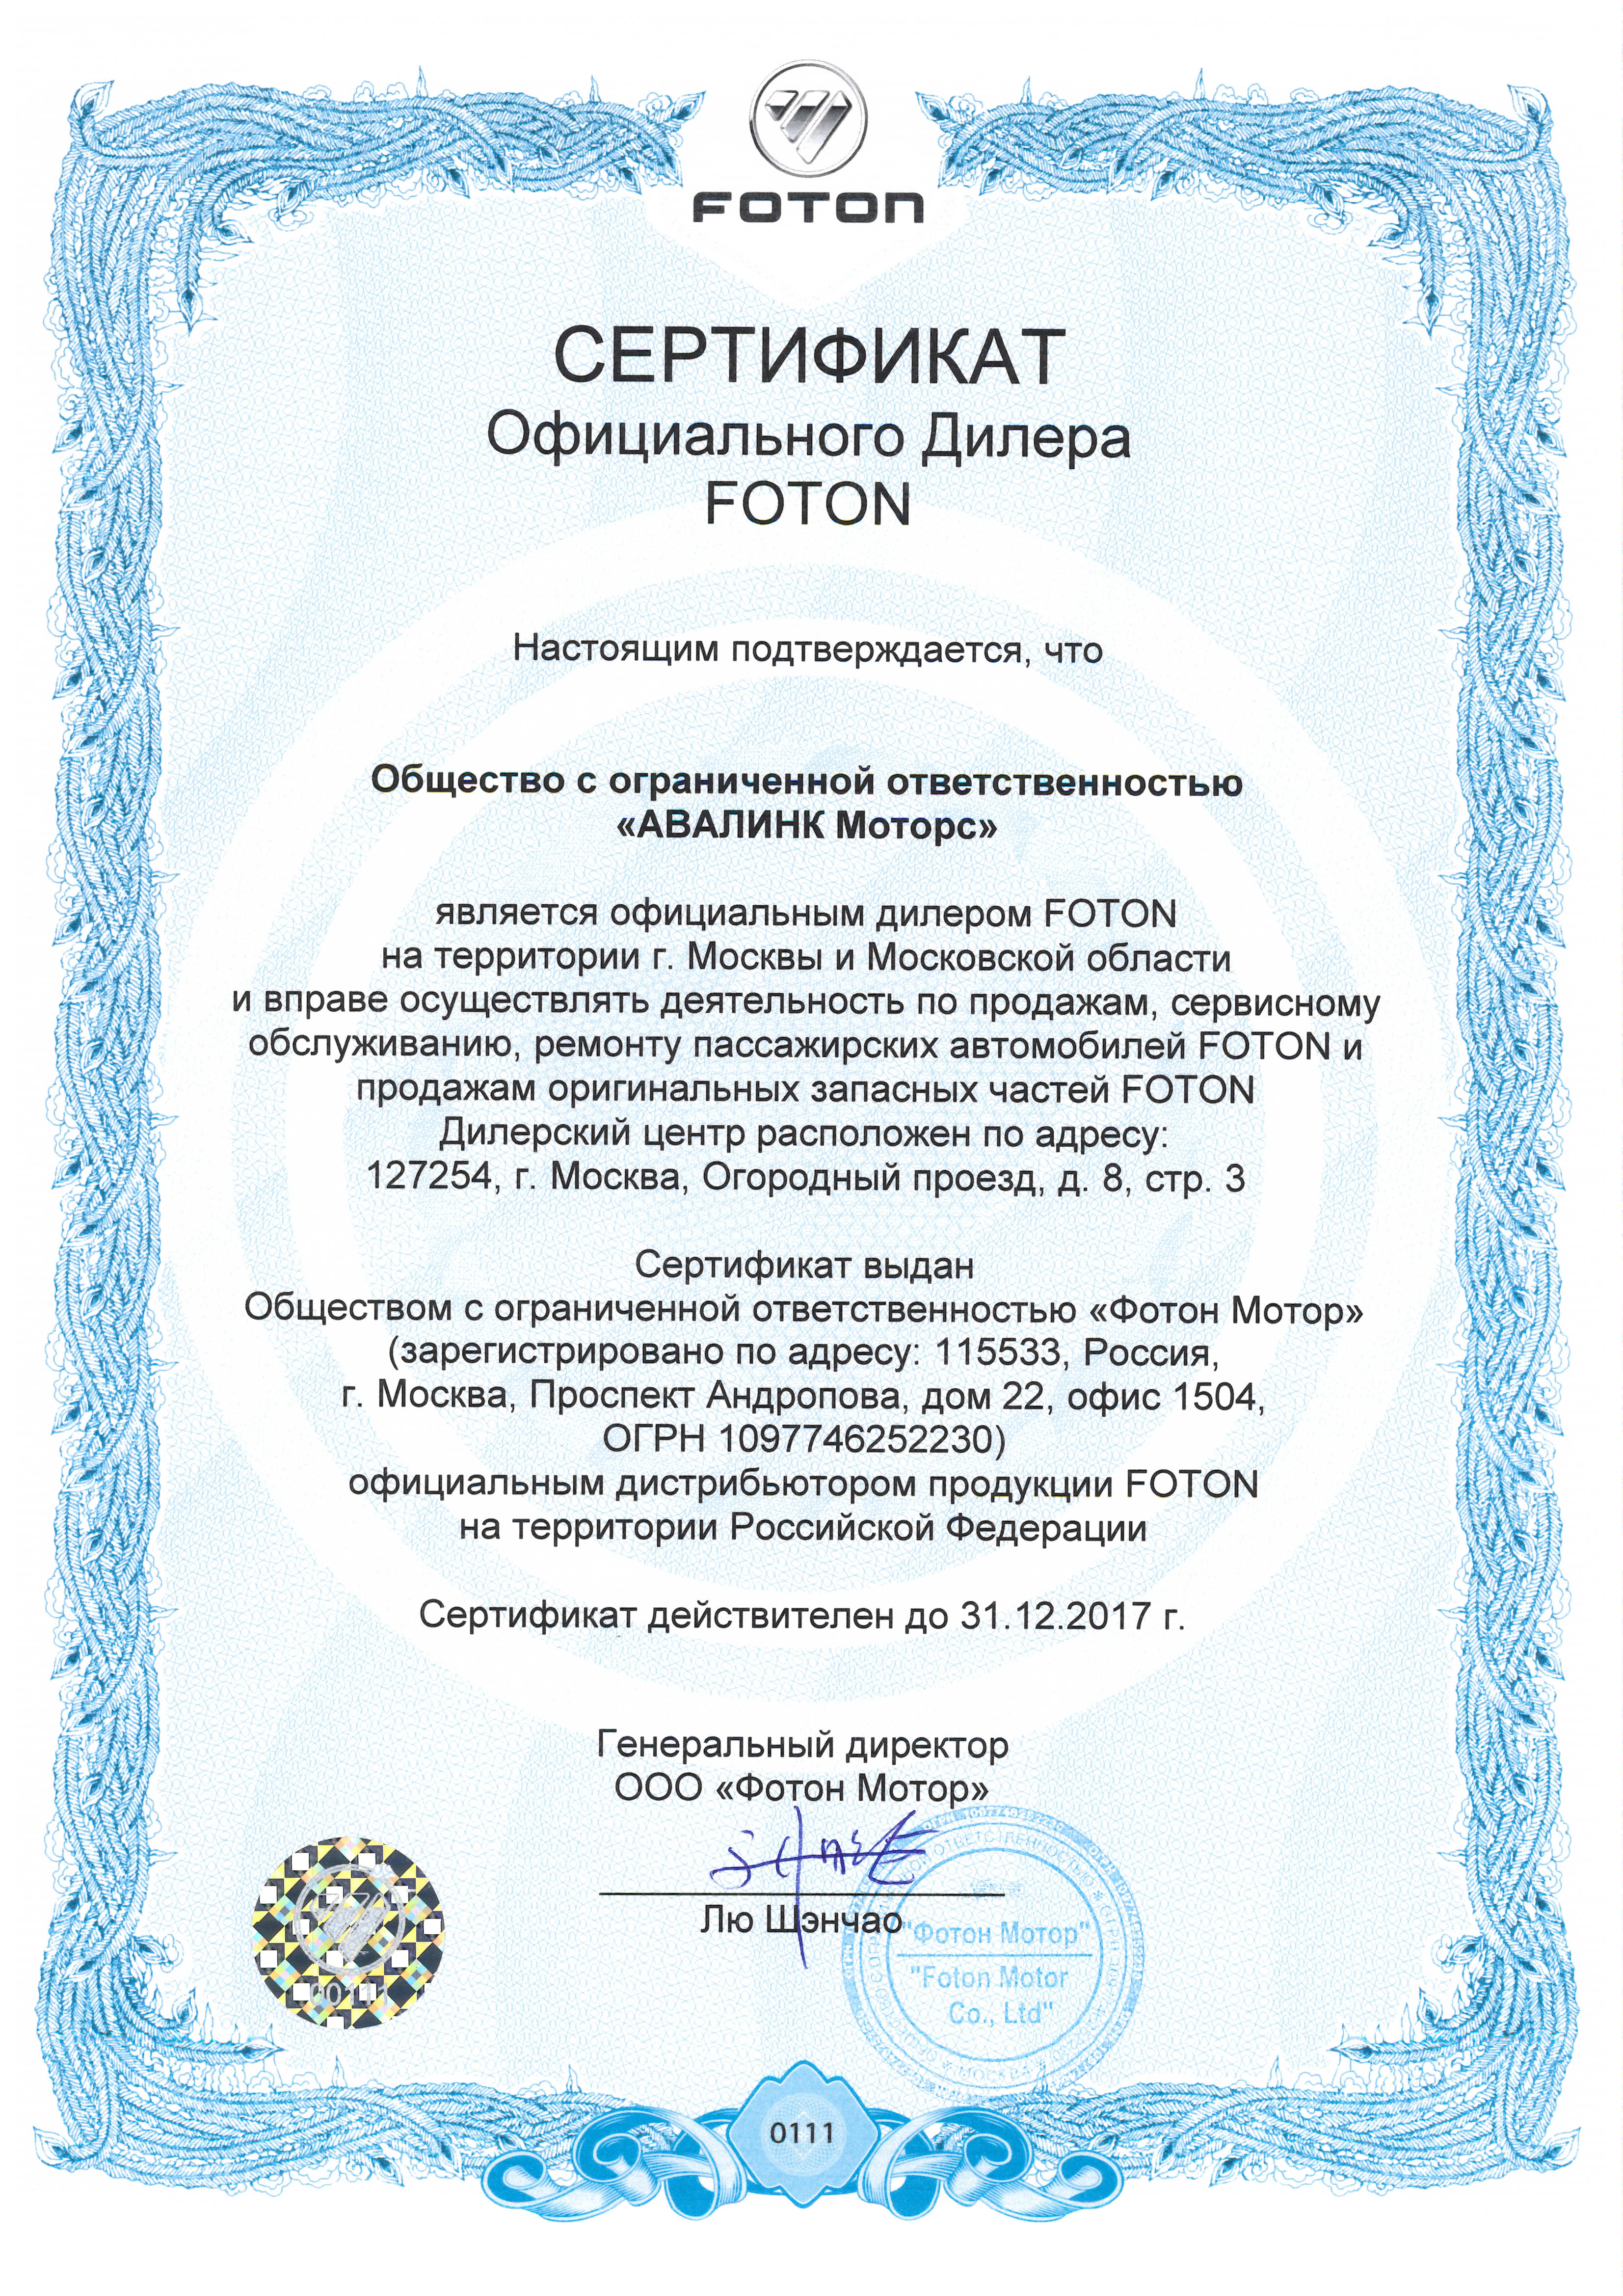 АВАЛИНК Москва FOTON сертификат